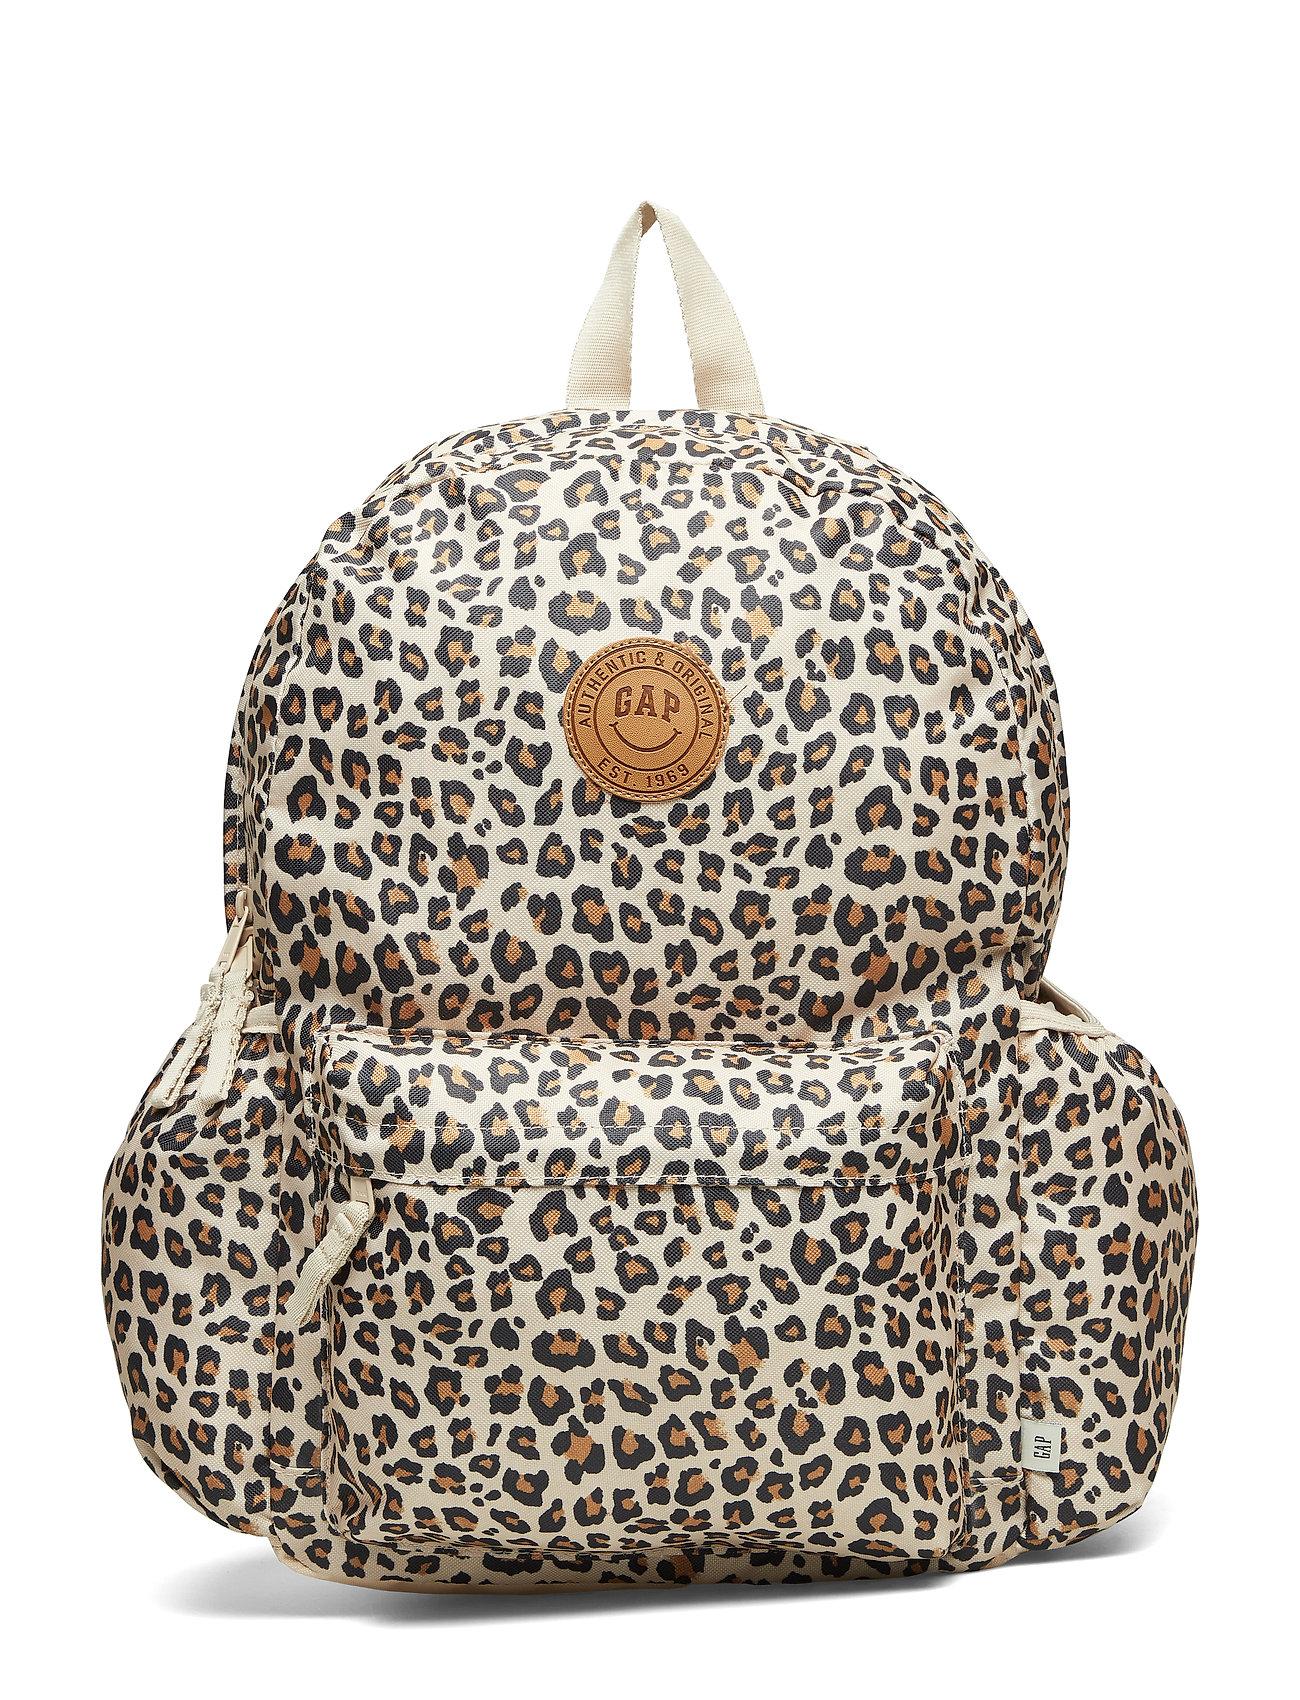 GAP Kids Leopard Senior Backpack - LEOPARD PRINT